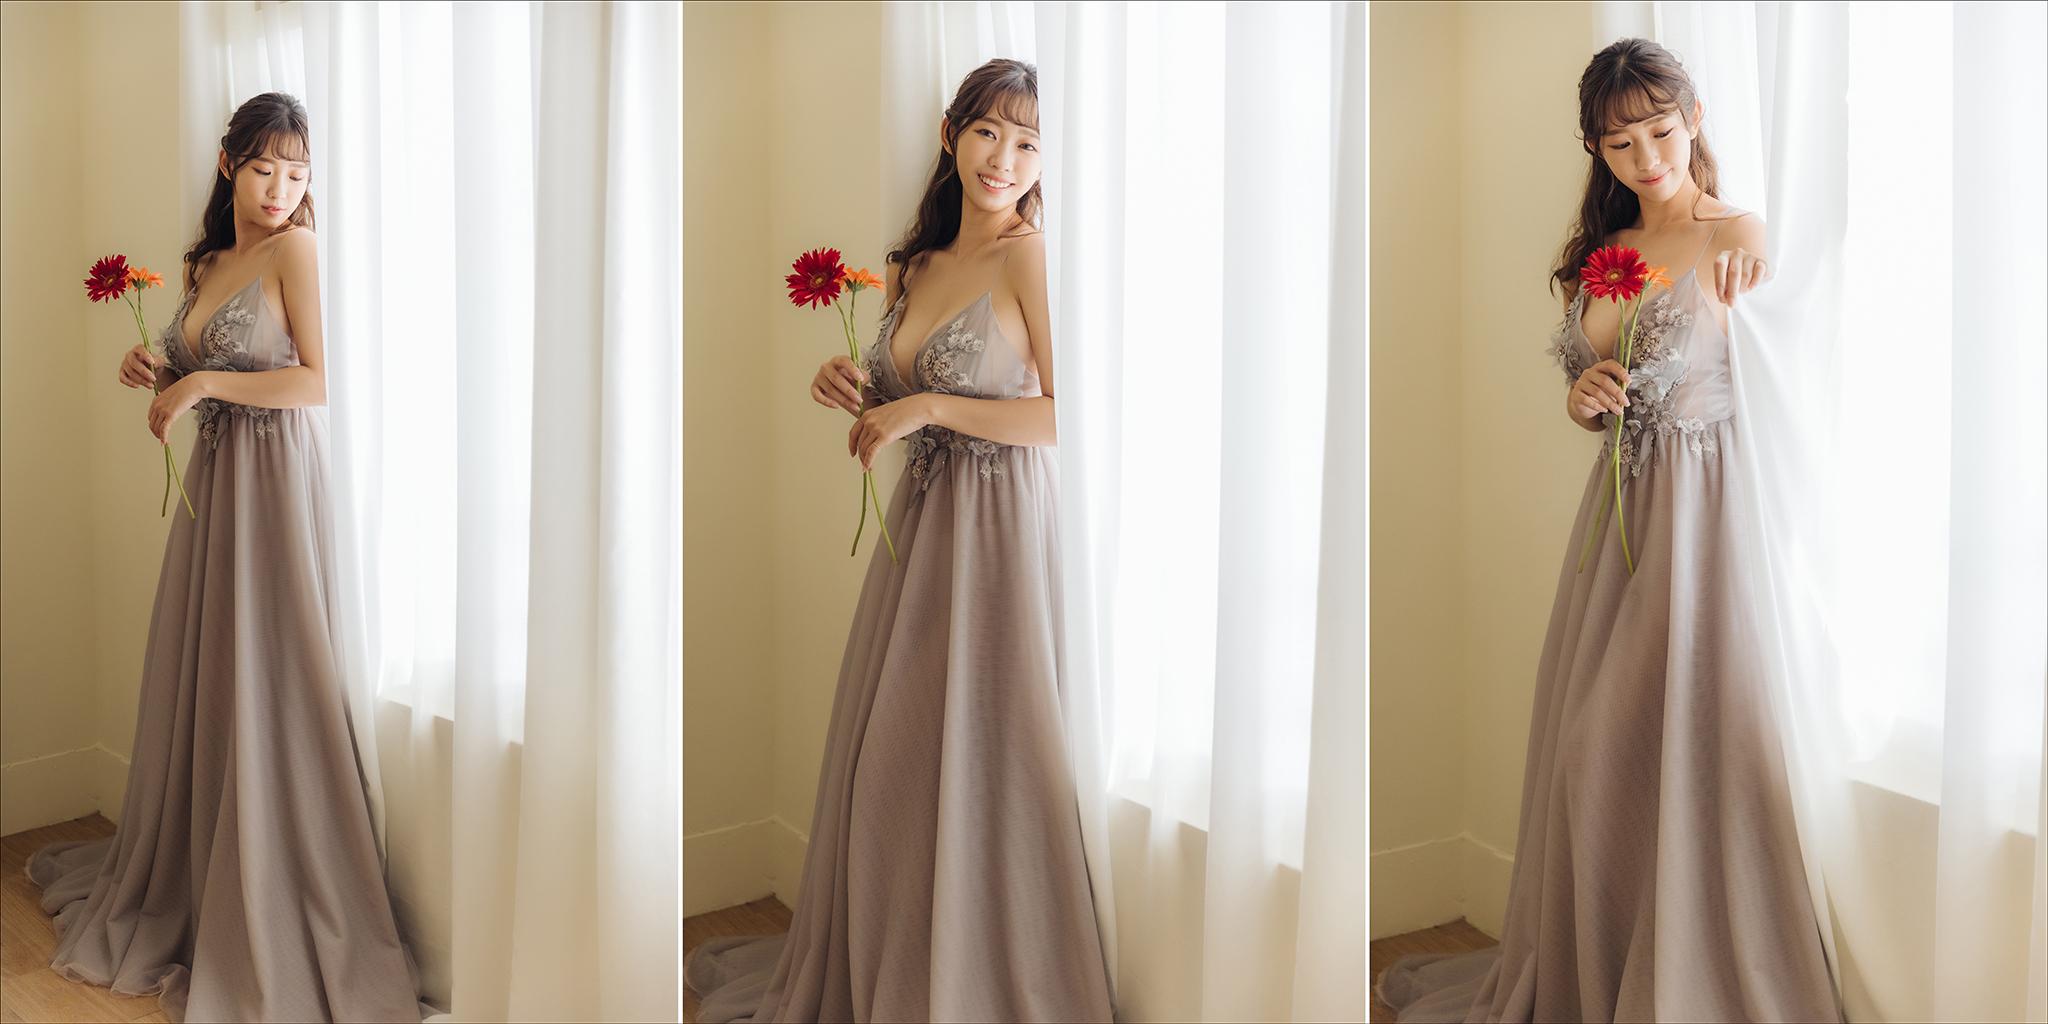 51577453851 f799509e81 o - 【自主婚紗】+江jiang+